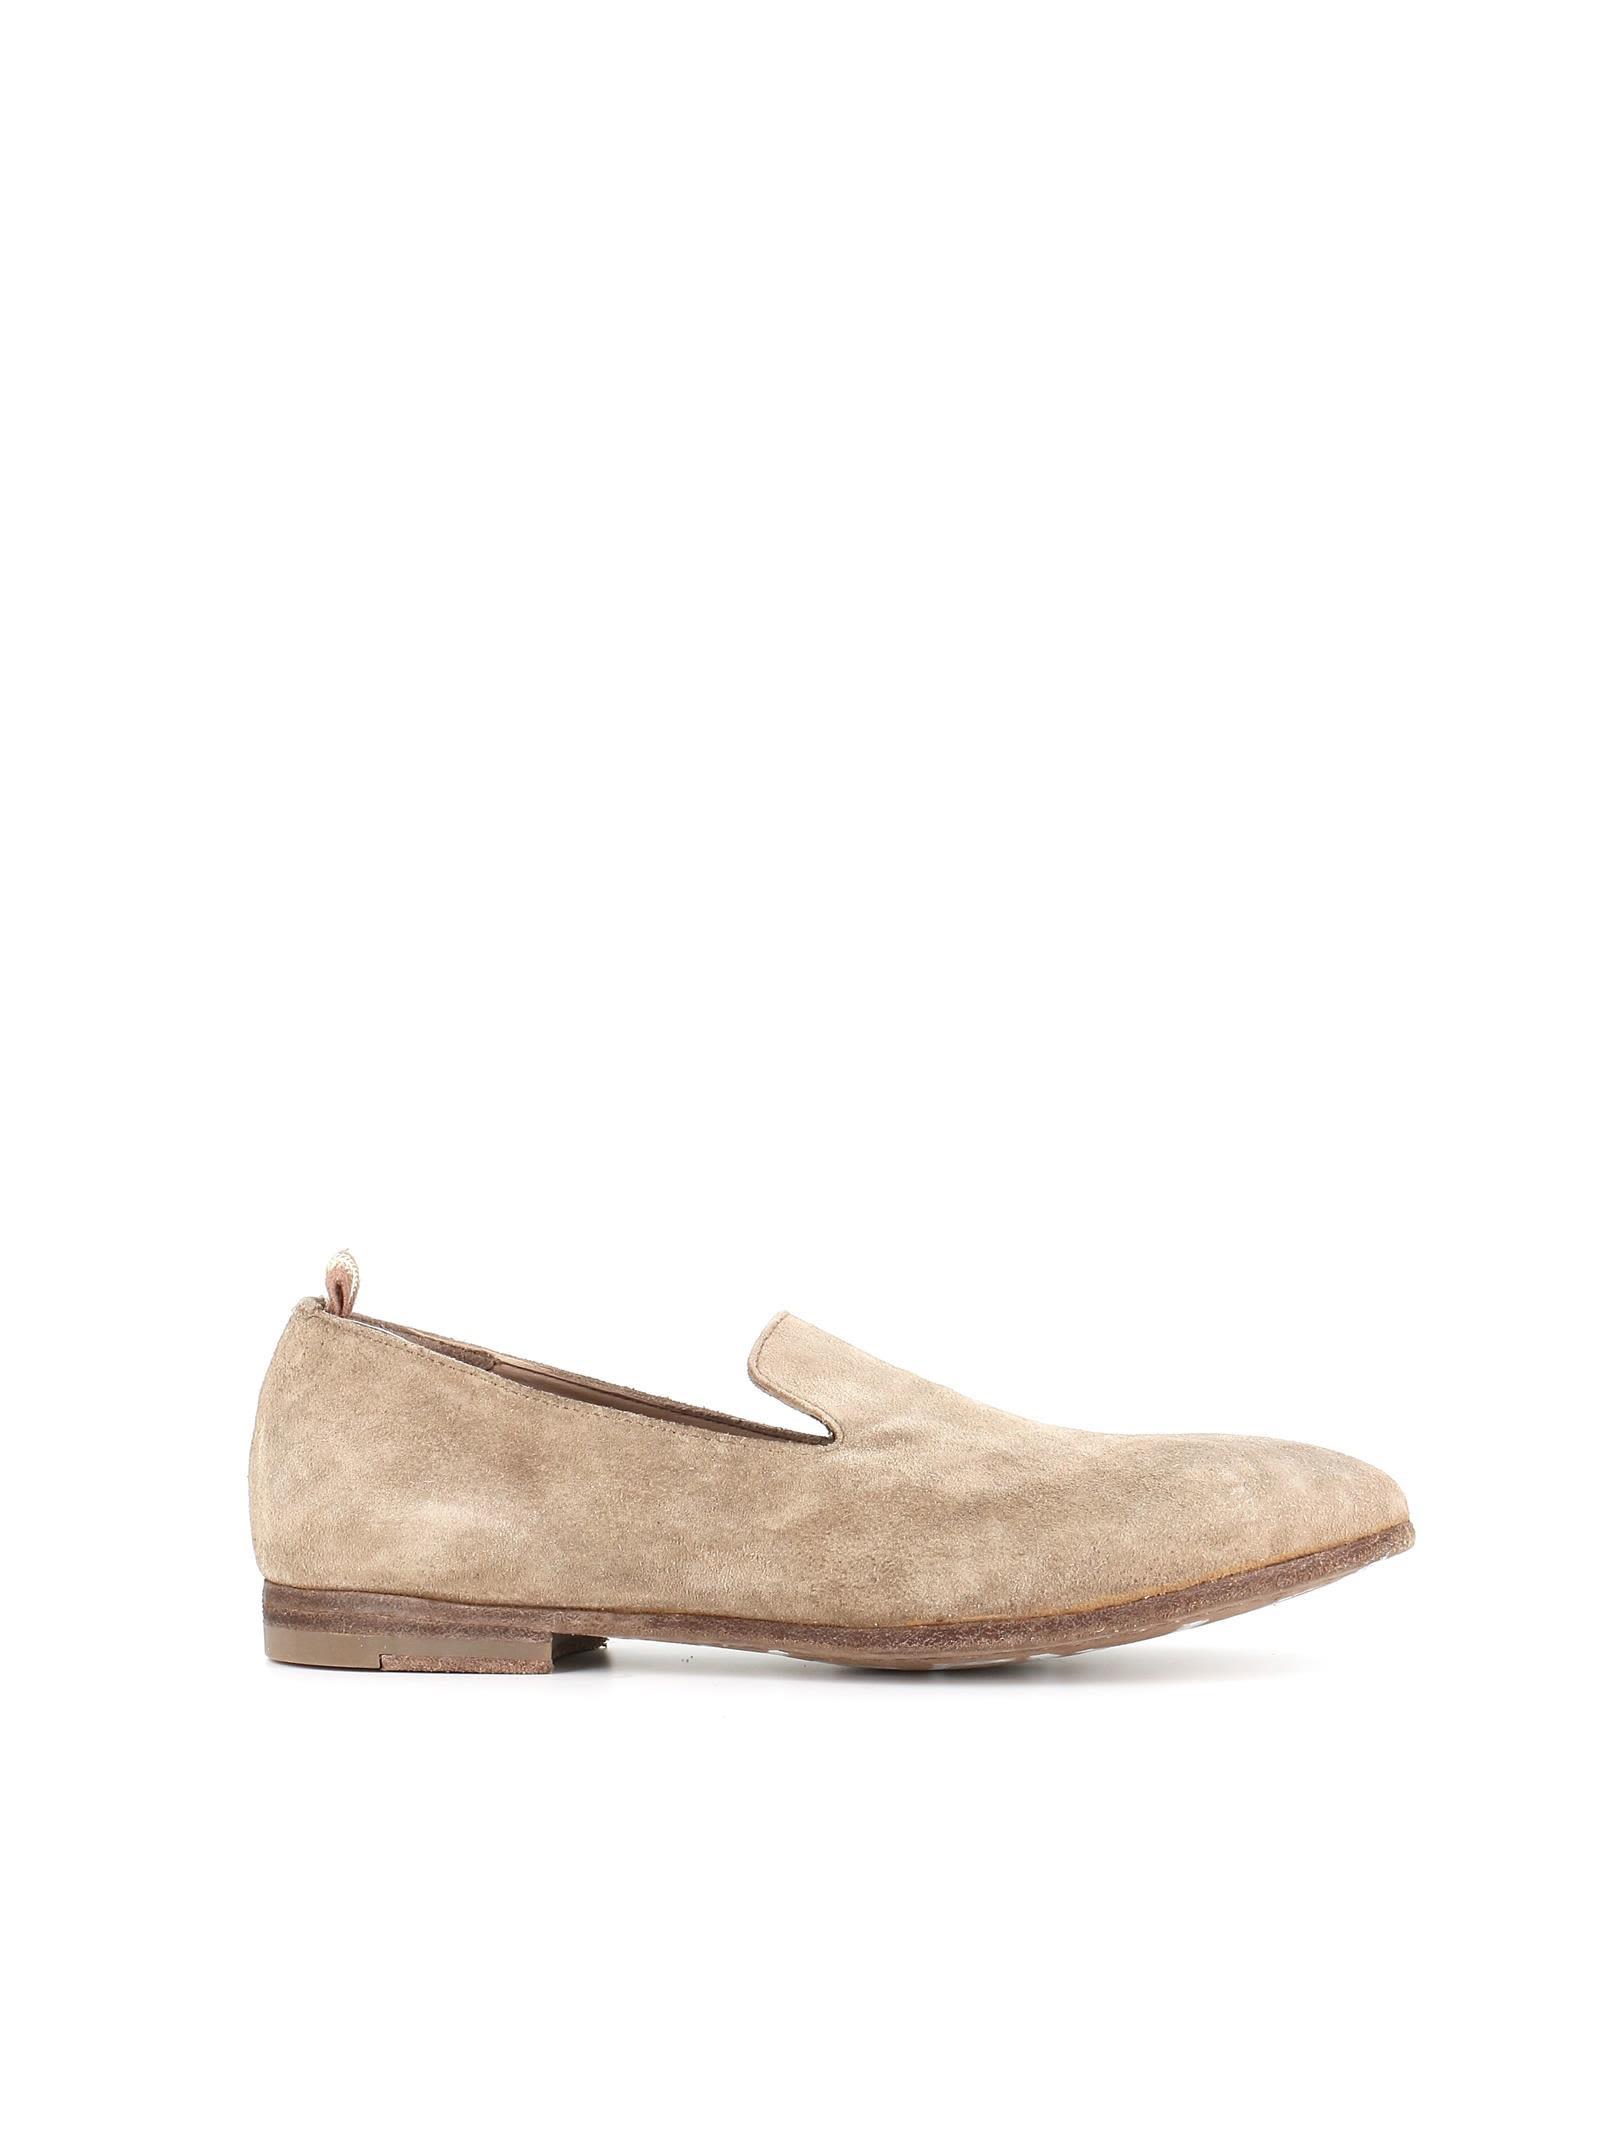 Officine Creative Leather Round-Toe Flats pick a best GUmww